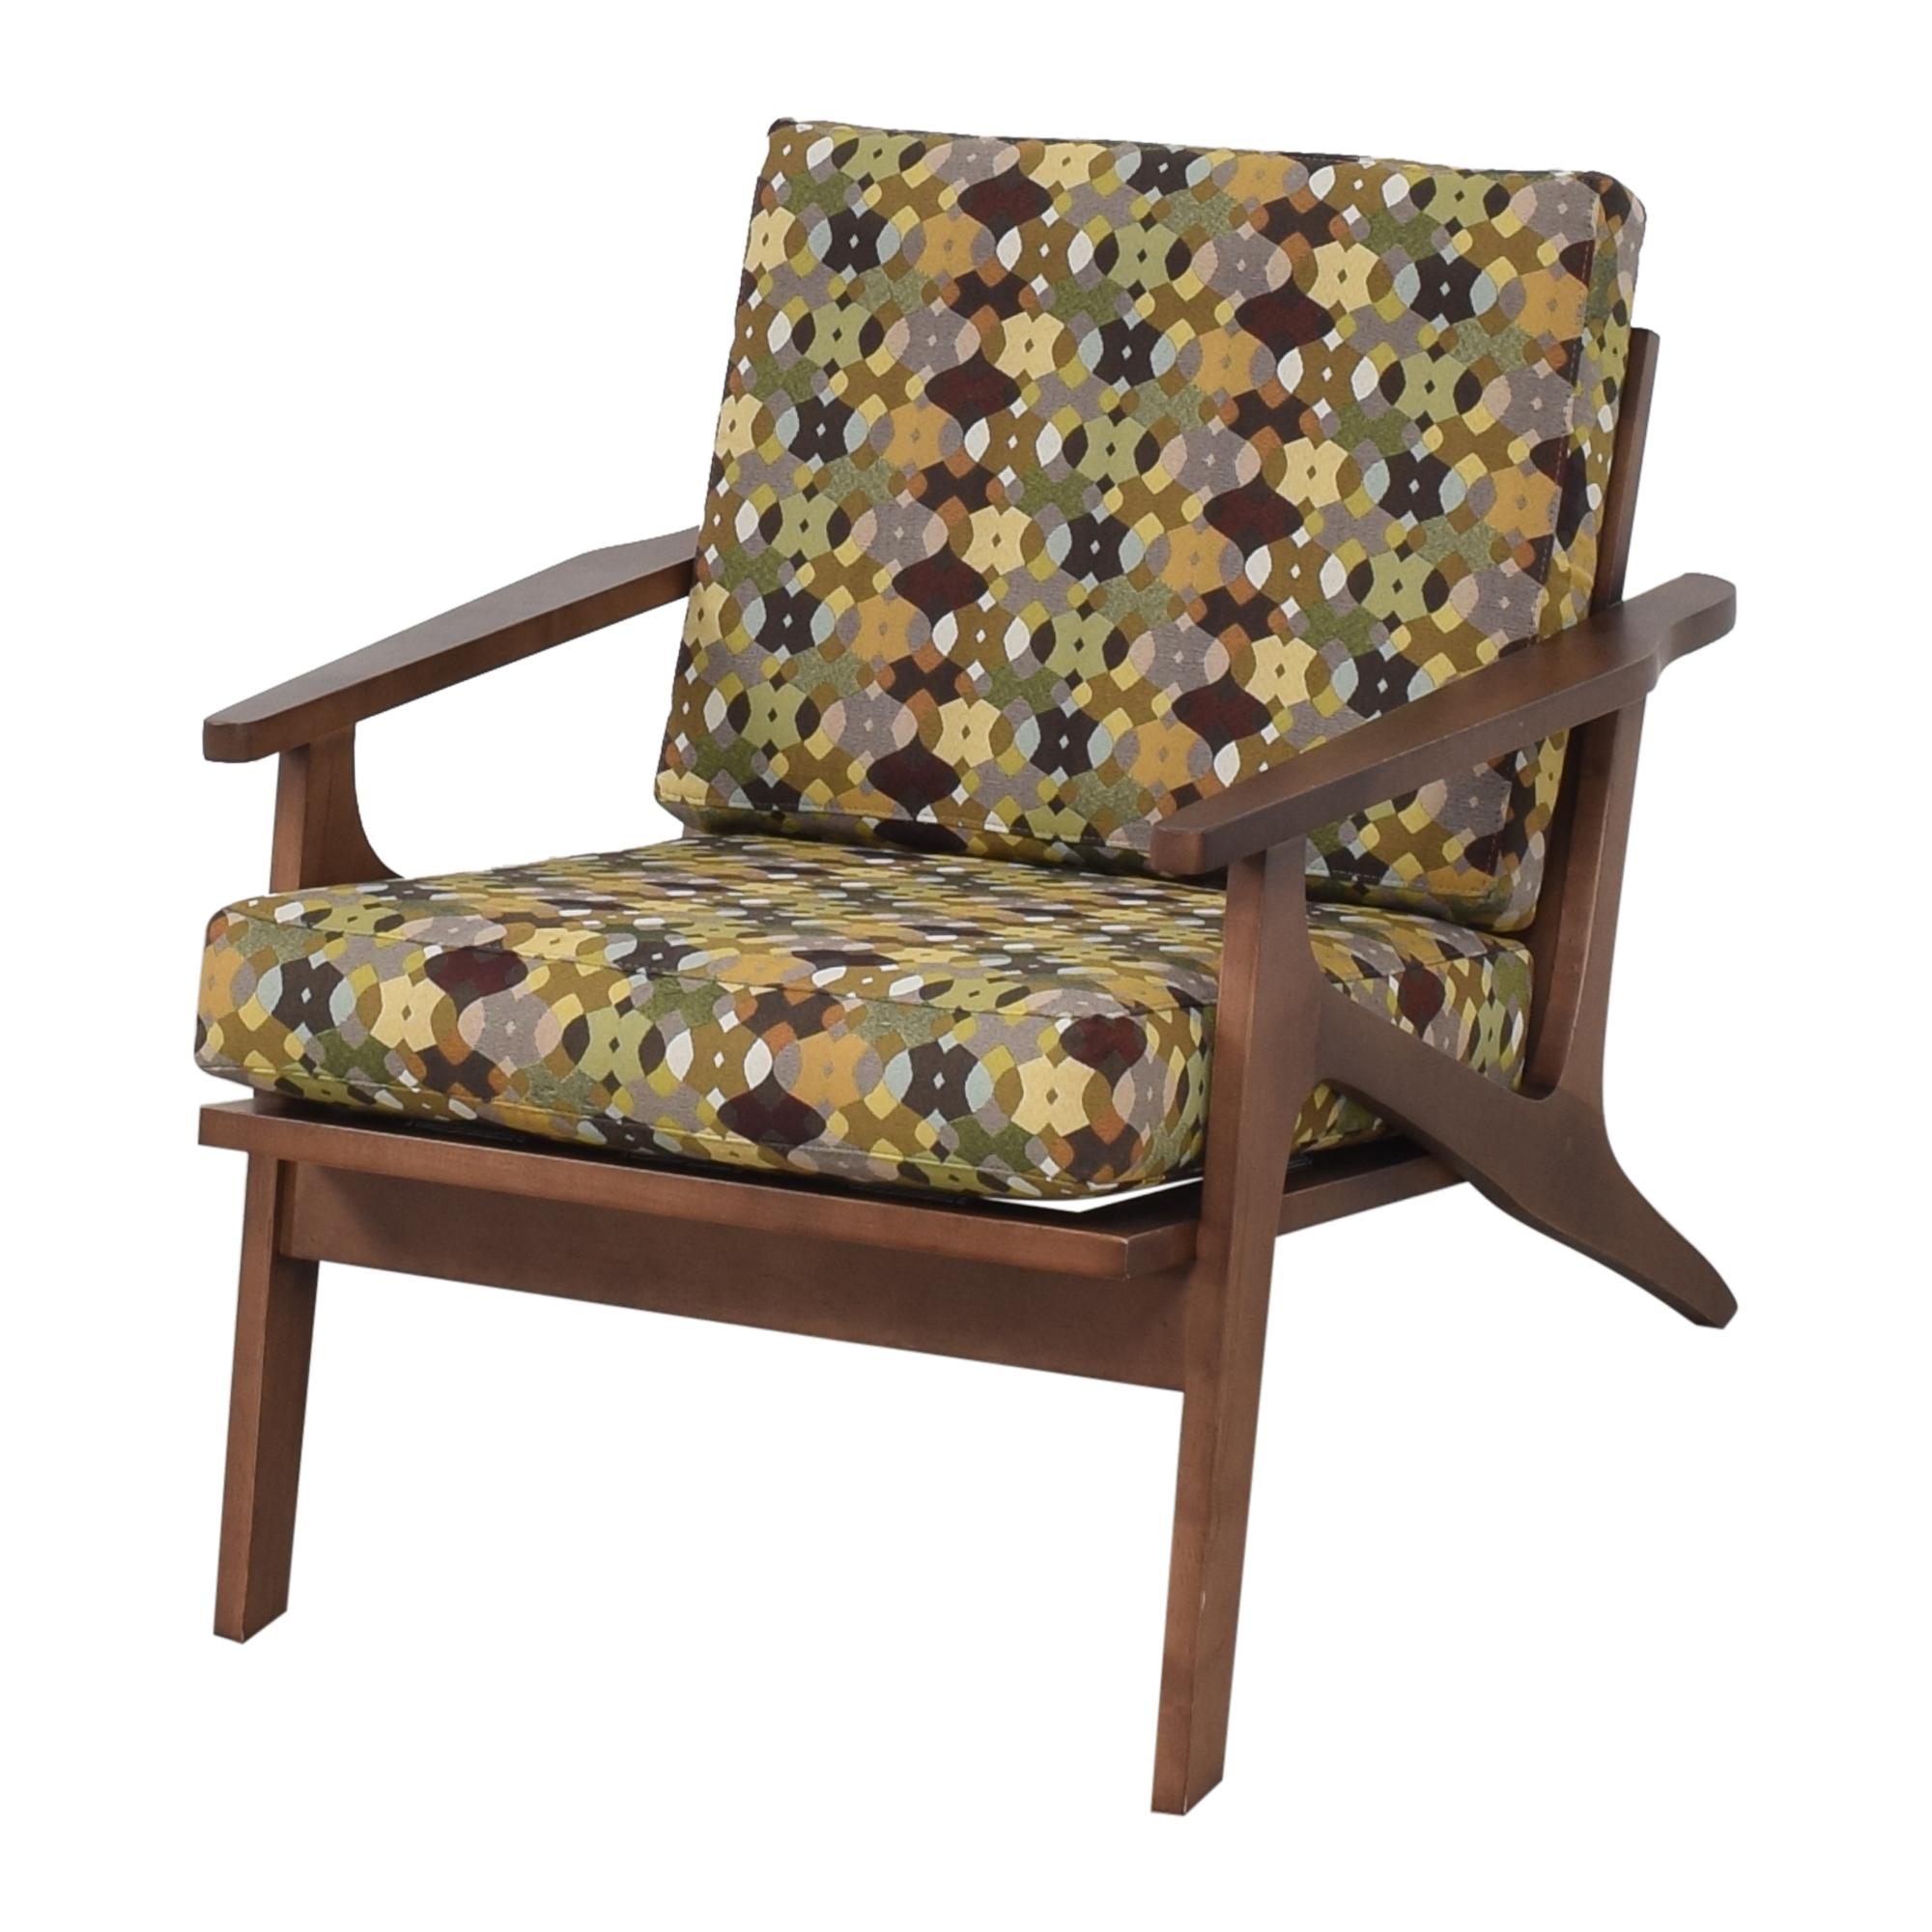 Room & Board Room & Board Sanna Chair Accent Chairs